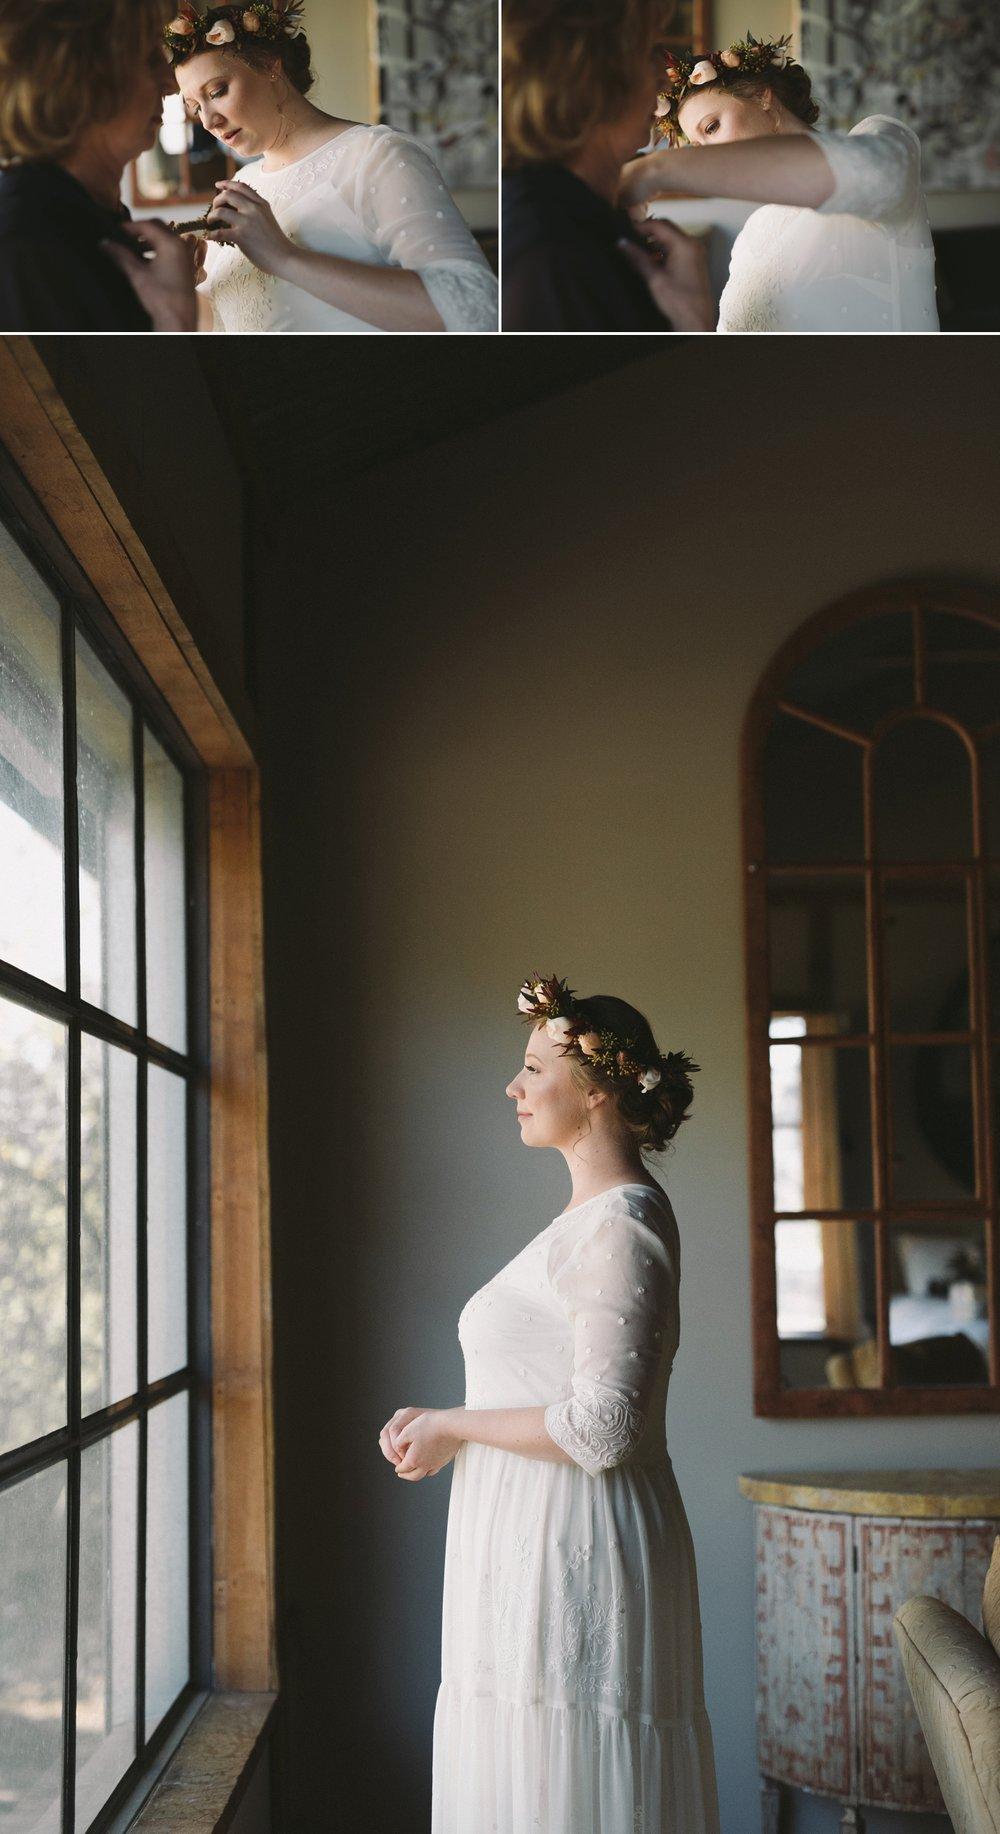 Jo & Aaron - Natural Wedding Photography in Adelaide - Beautiful, modern wedding photographer - Al Ru Farm Wedding Photography - Katherine Schultz_0006.jpg